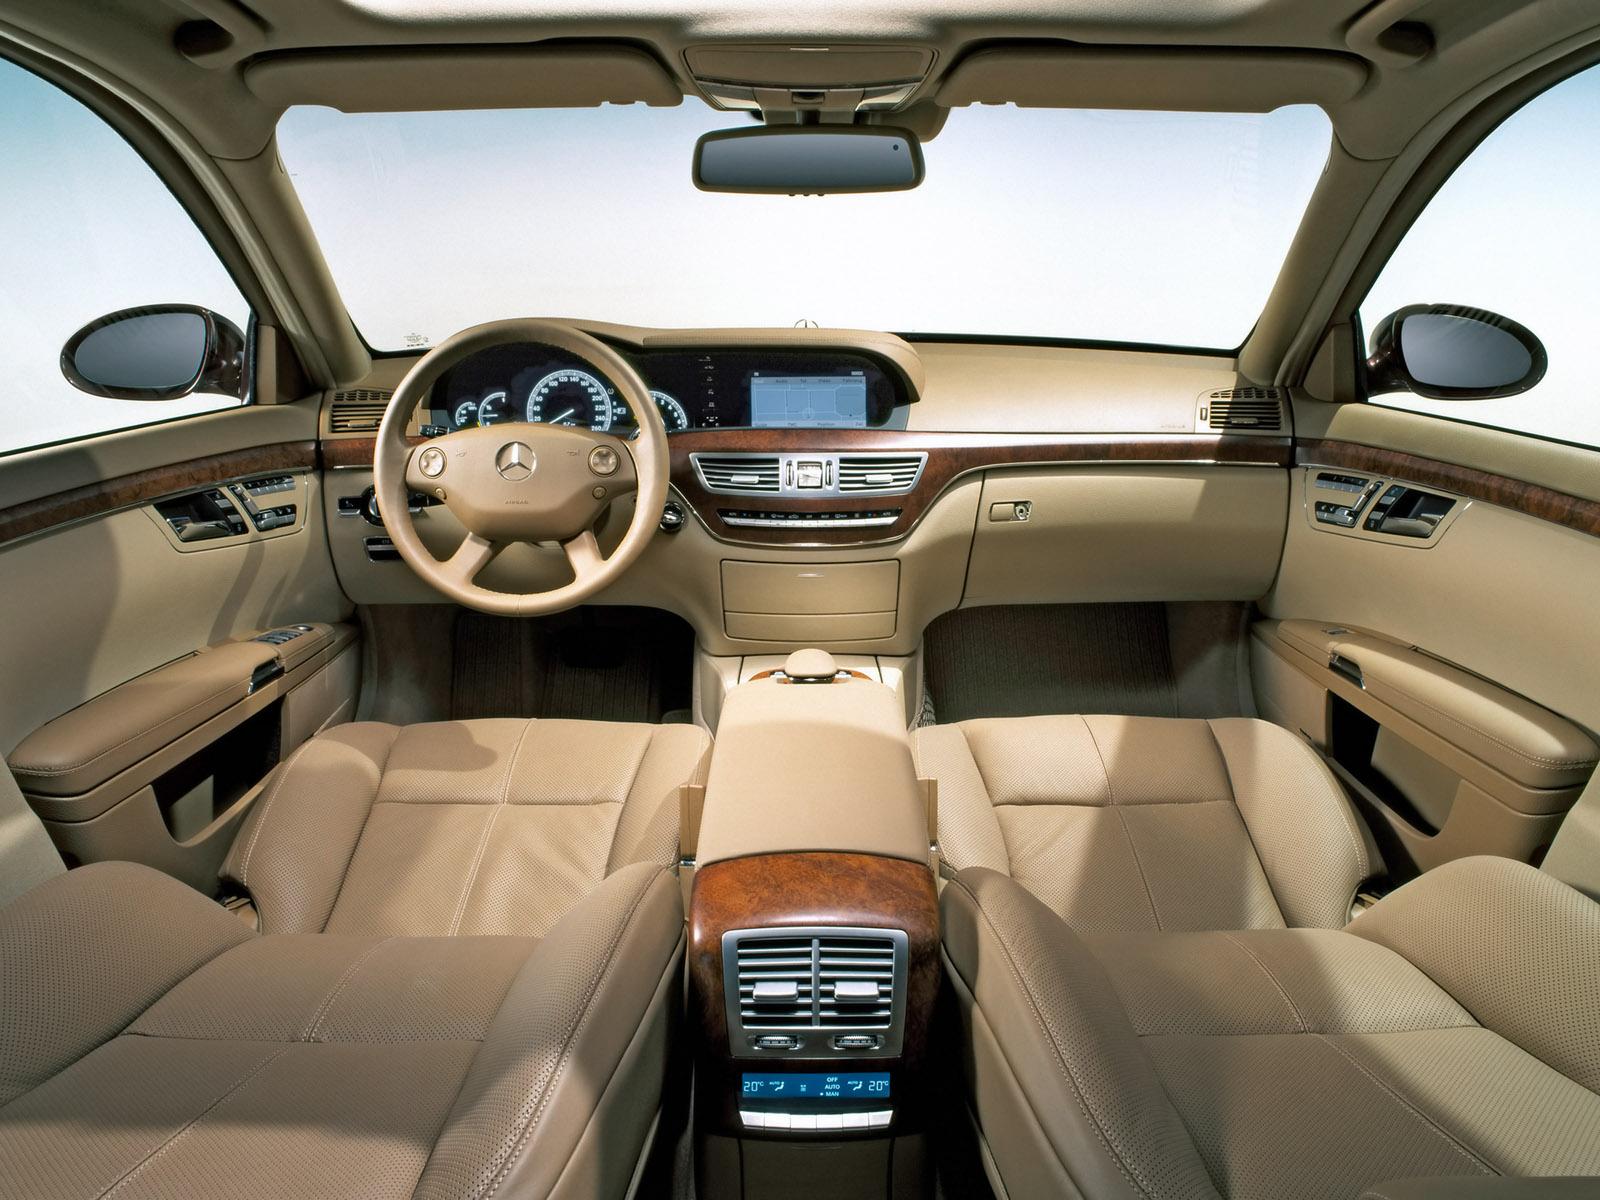 mersedes+arabalar+HEDZA+%252852%2529 Mercedes Modelleri